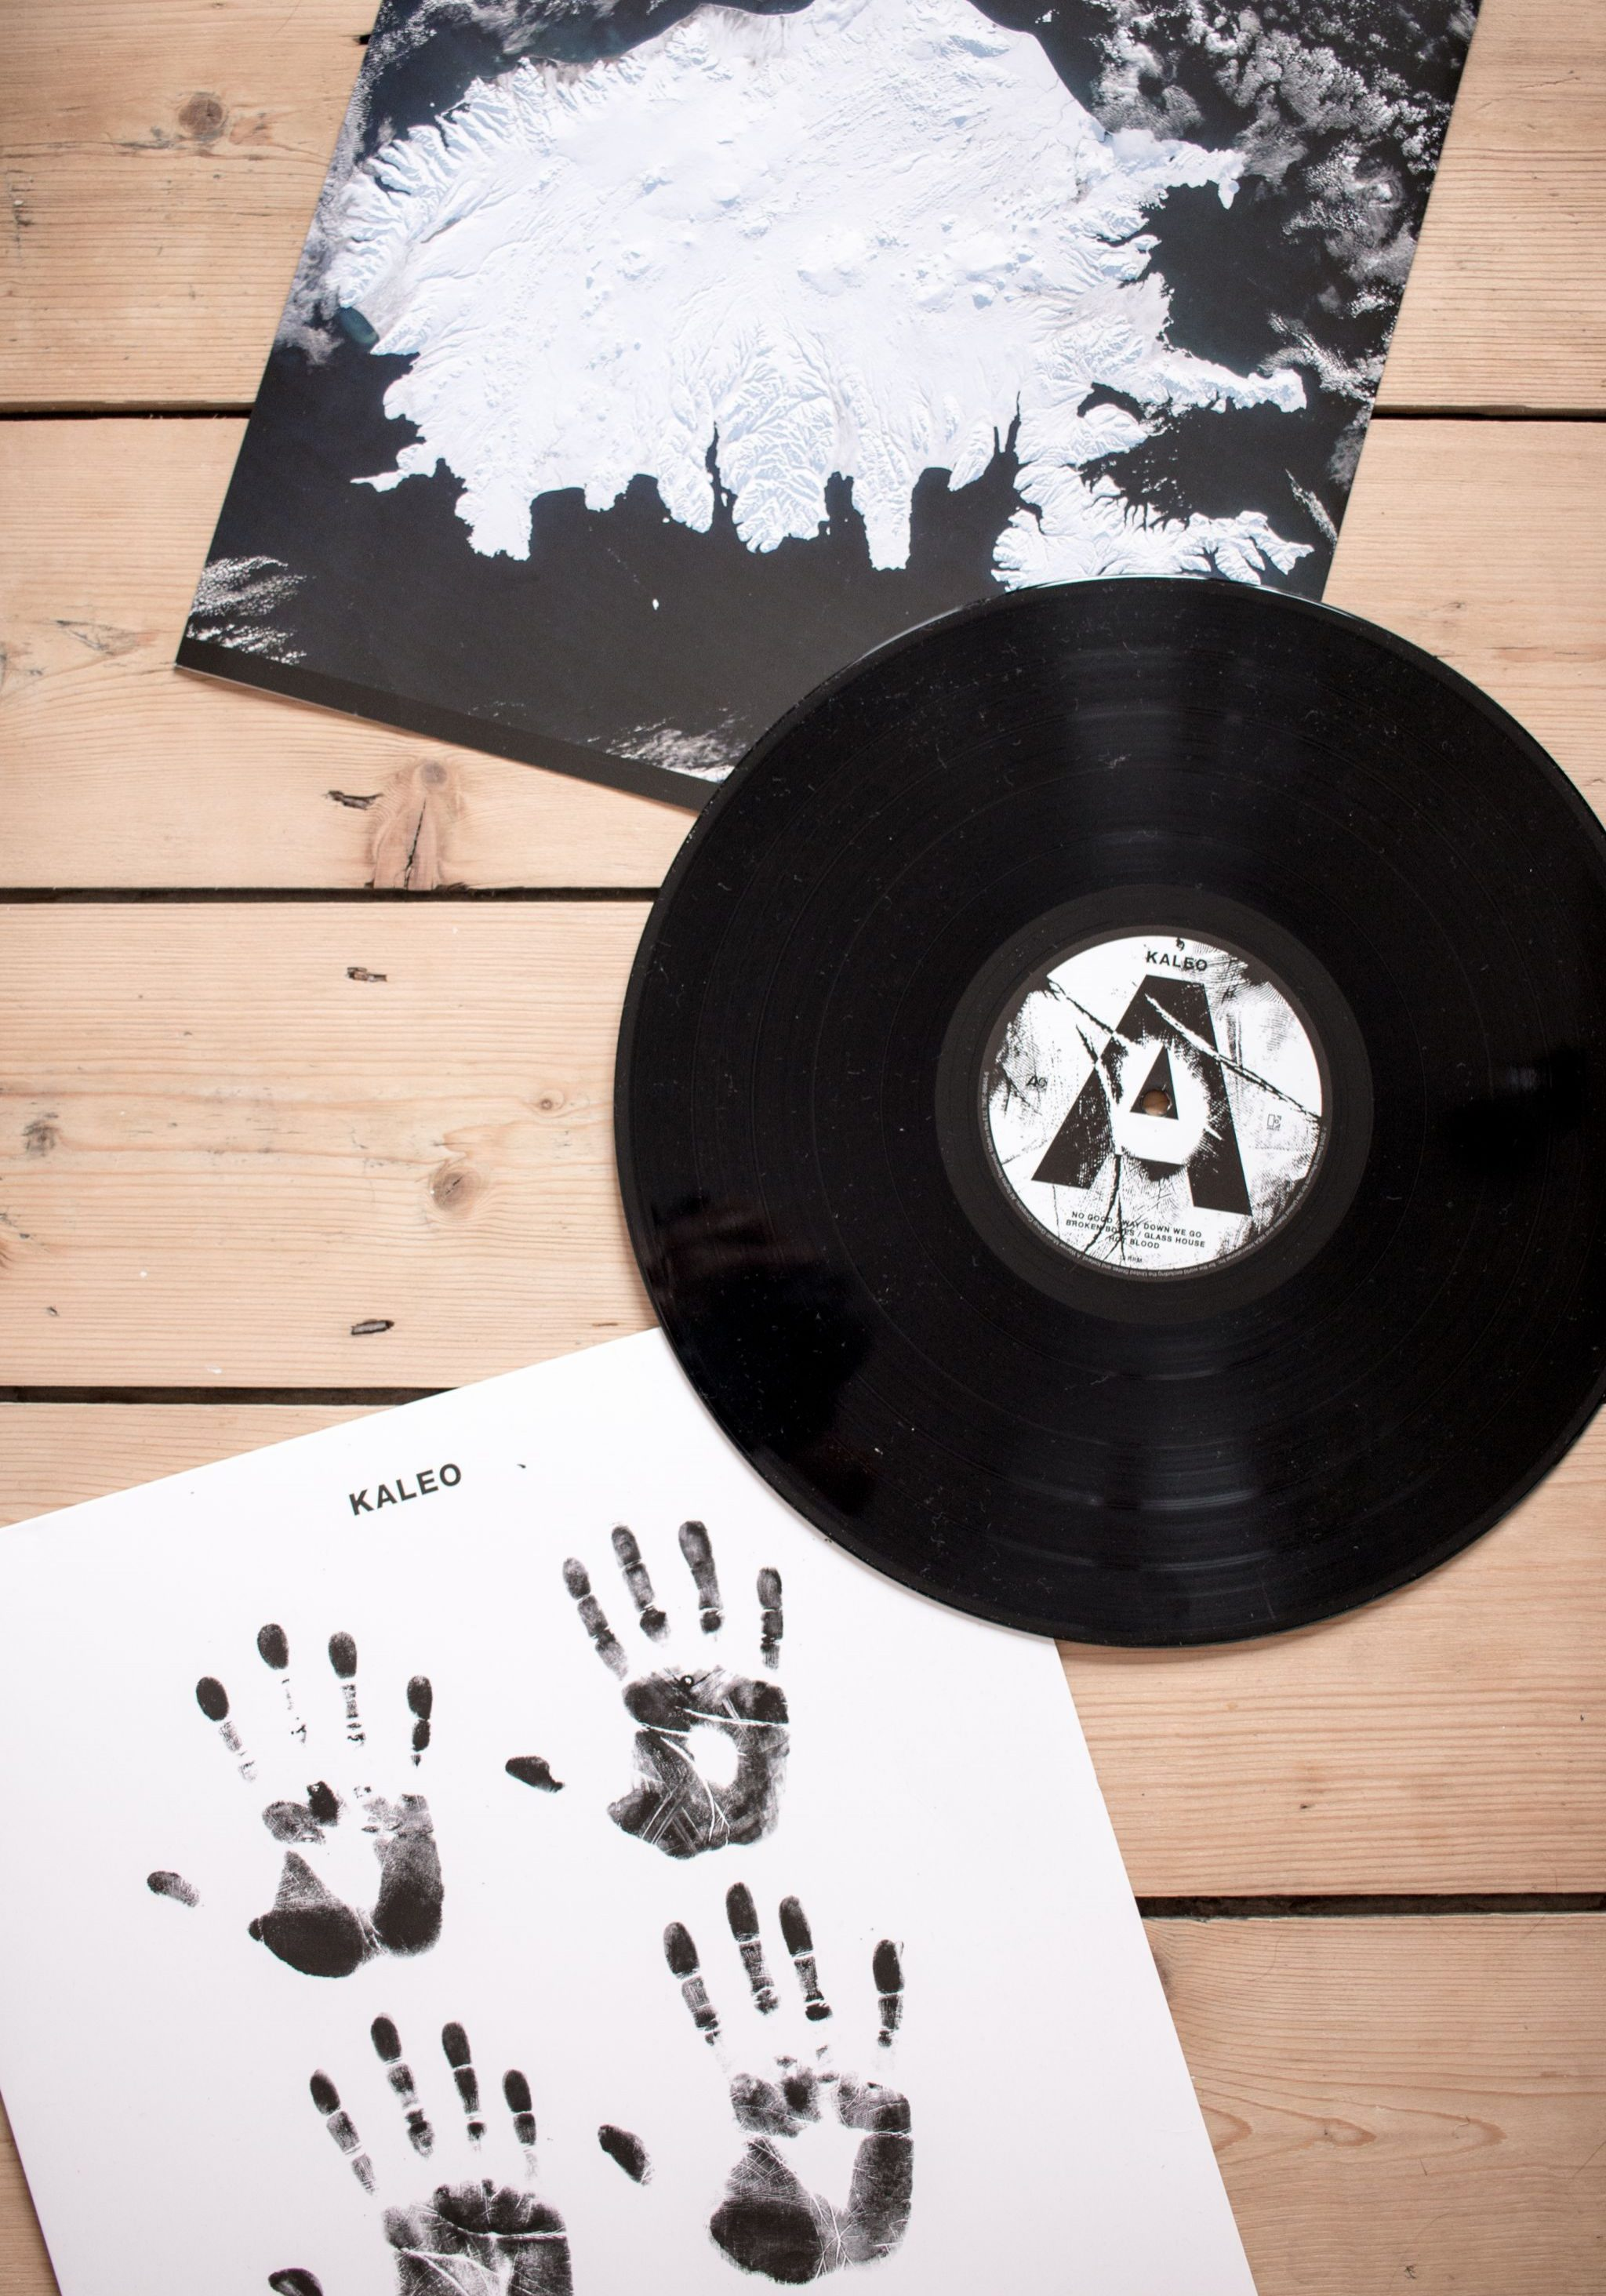 vinyl-collection-kaleo